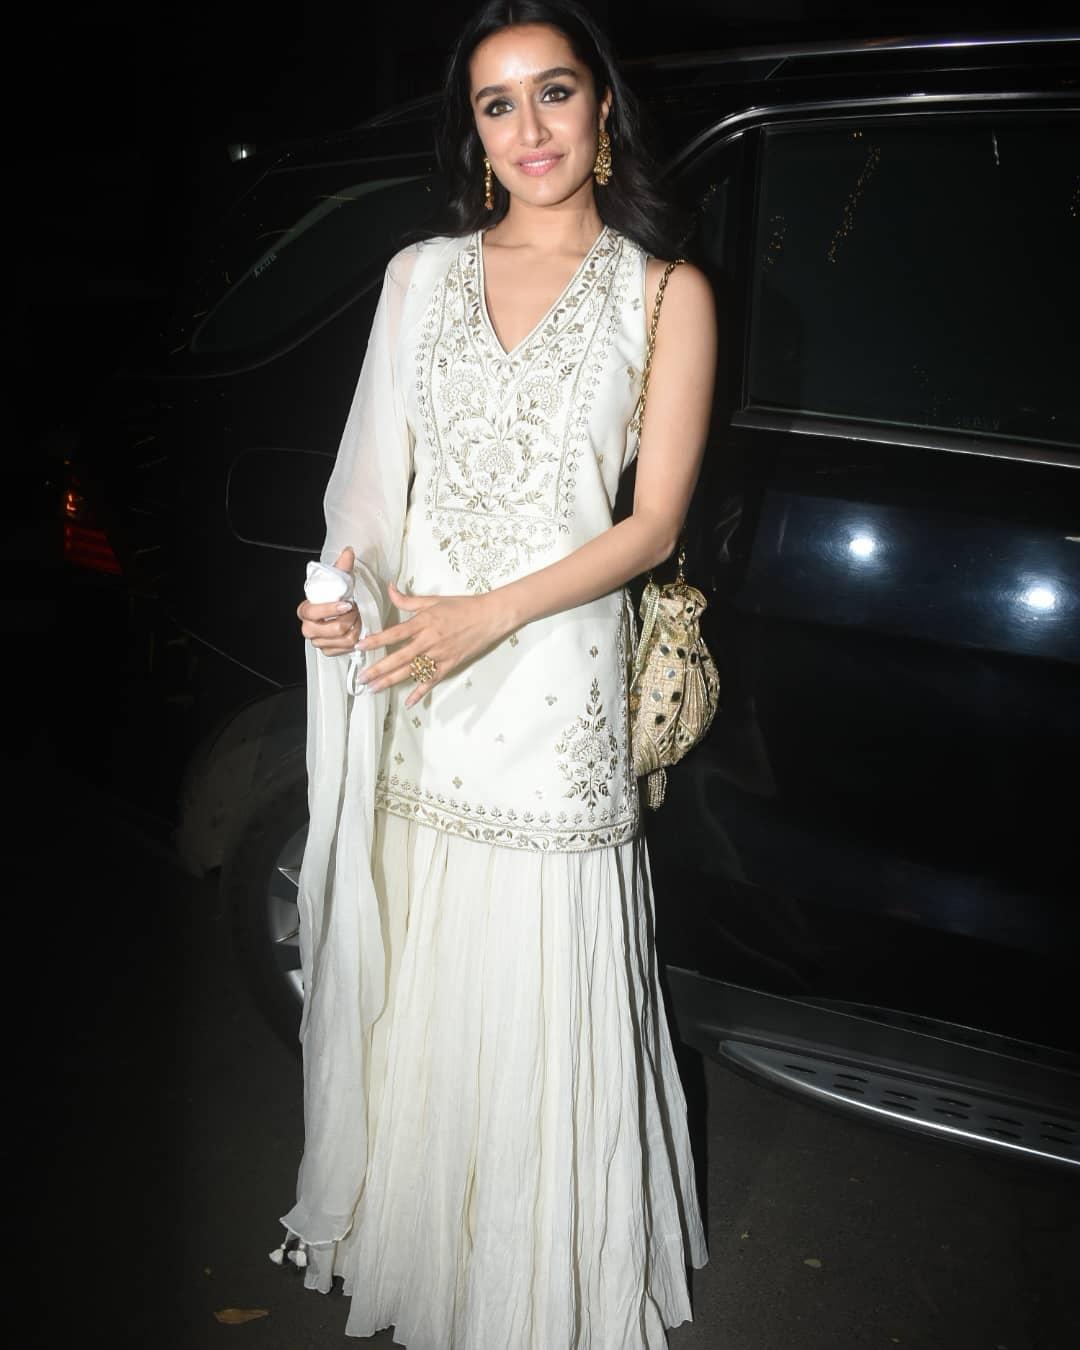 Shraddha Kapoor in ivory lehenga set by Anita Dongre fro cousin's wedding7.1